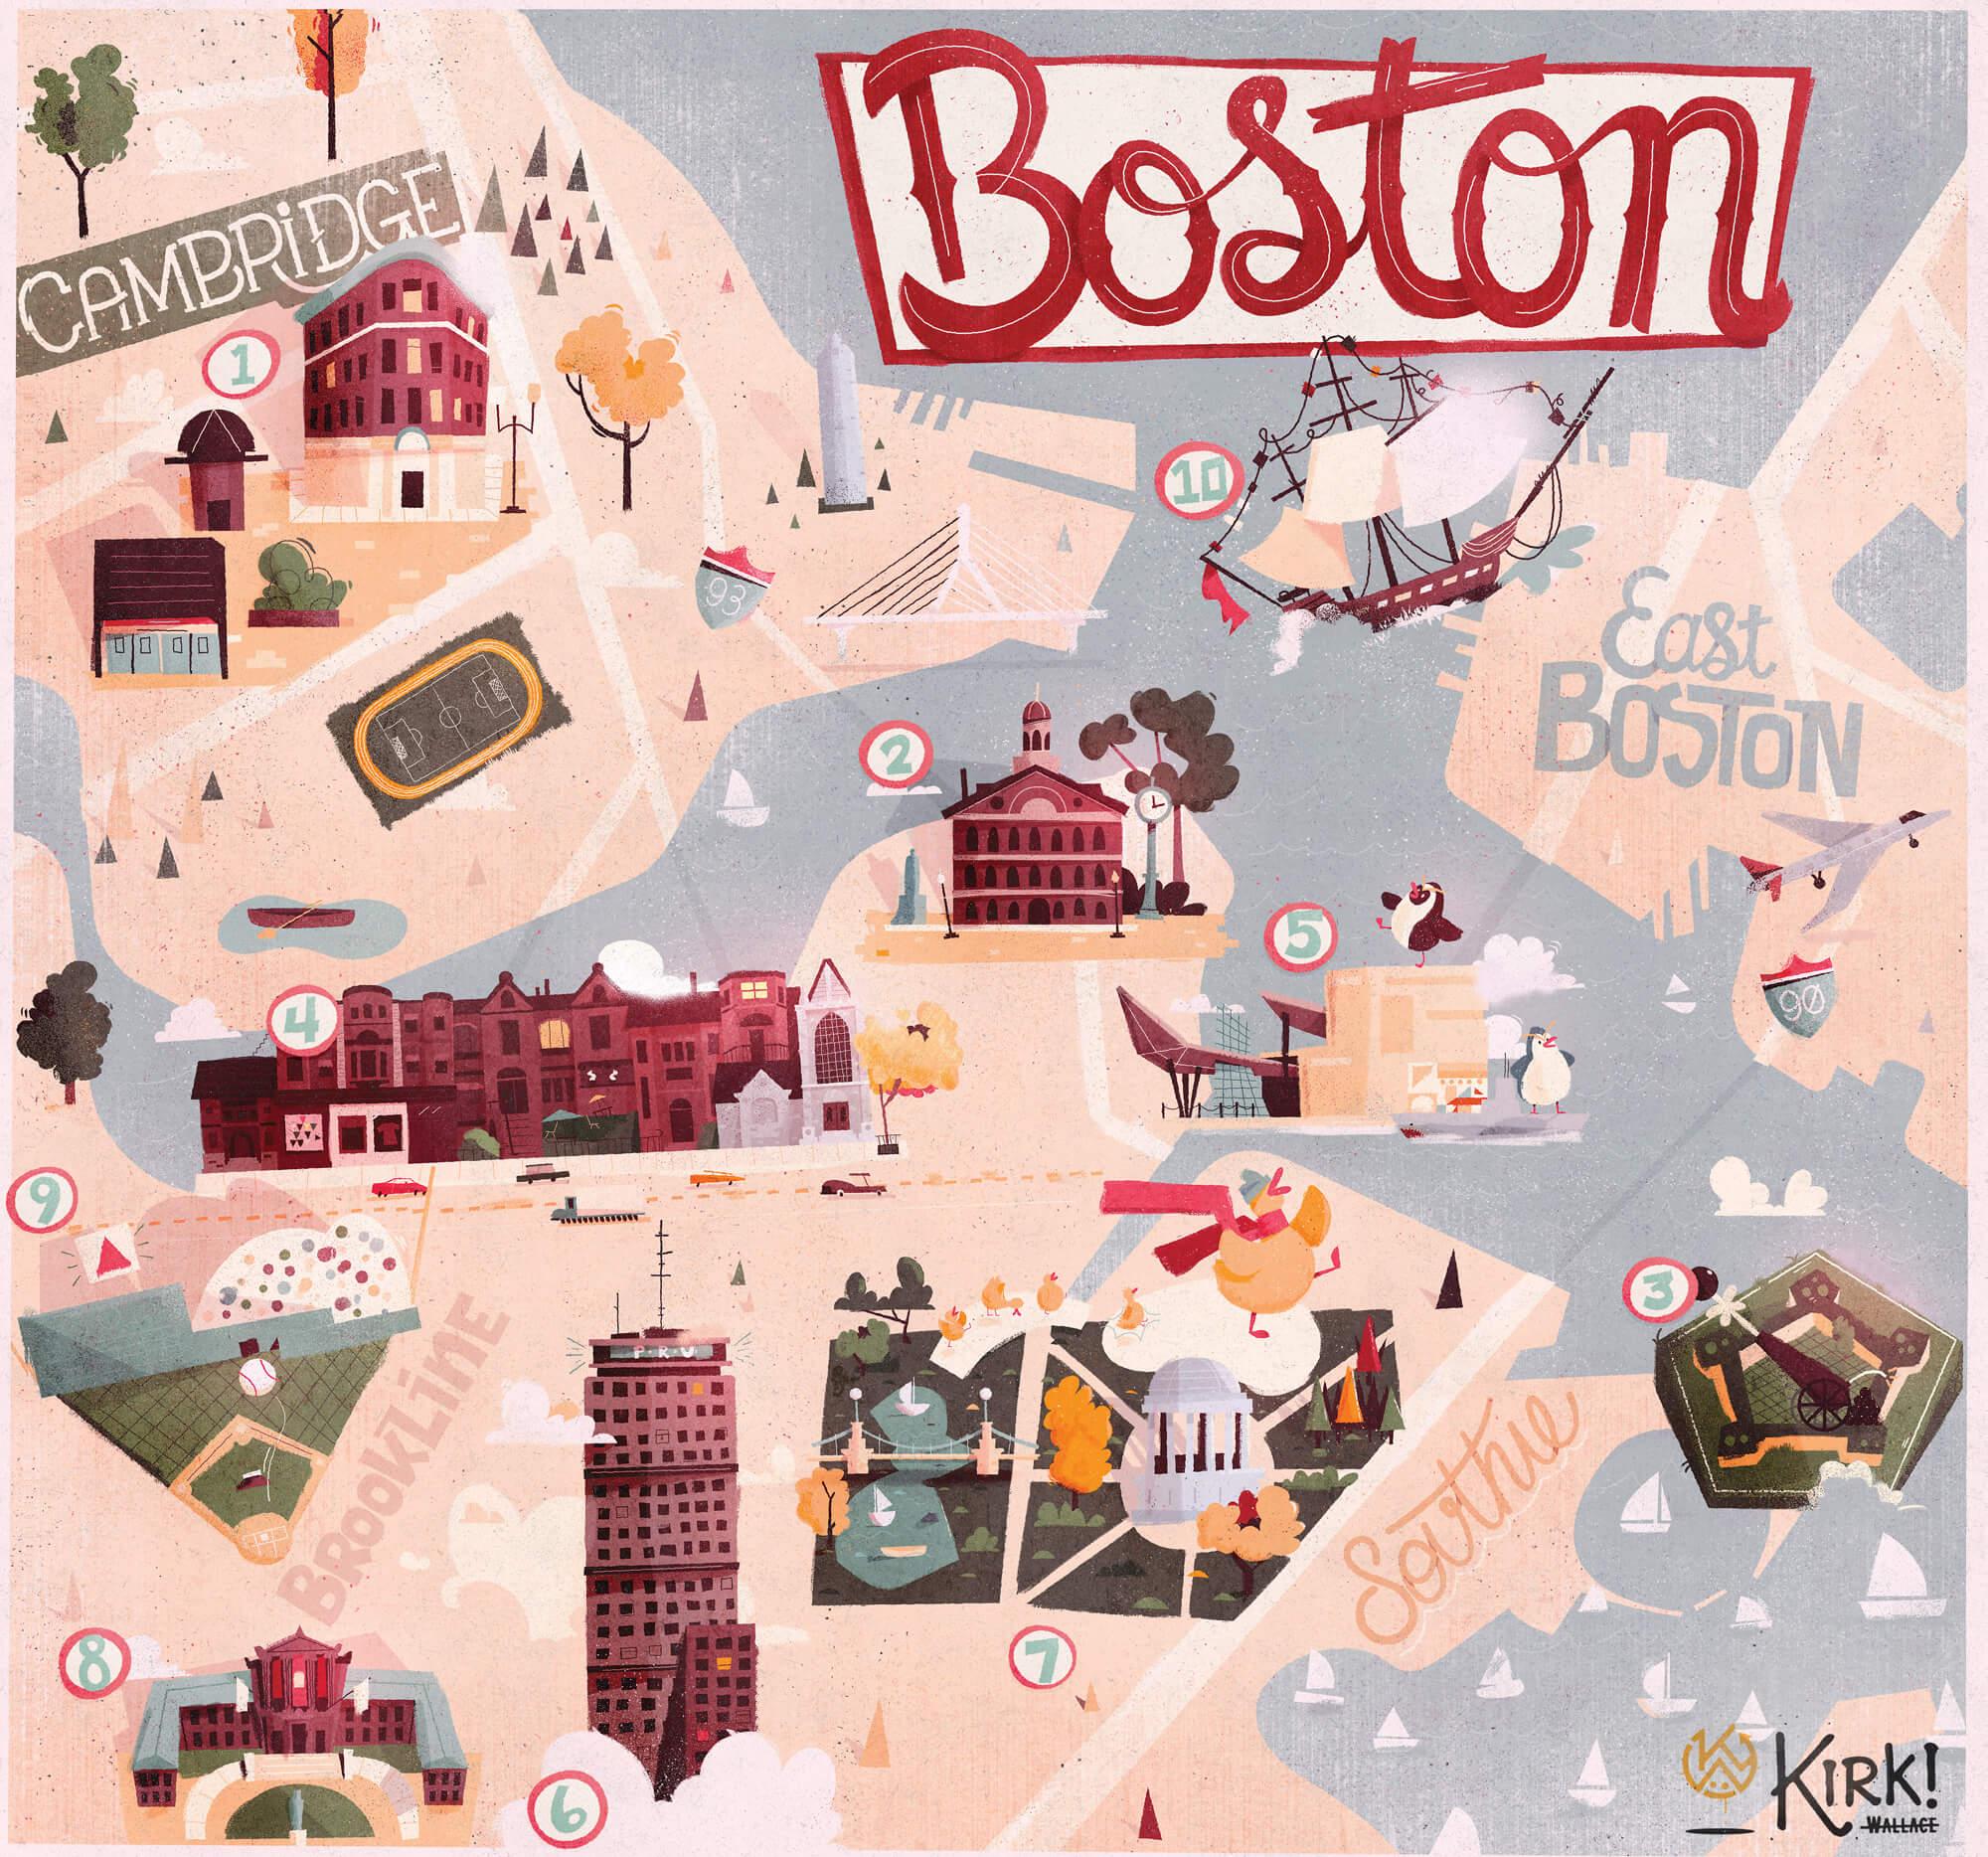 uber-kirk.wallace-boston-01-WEB.jpg